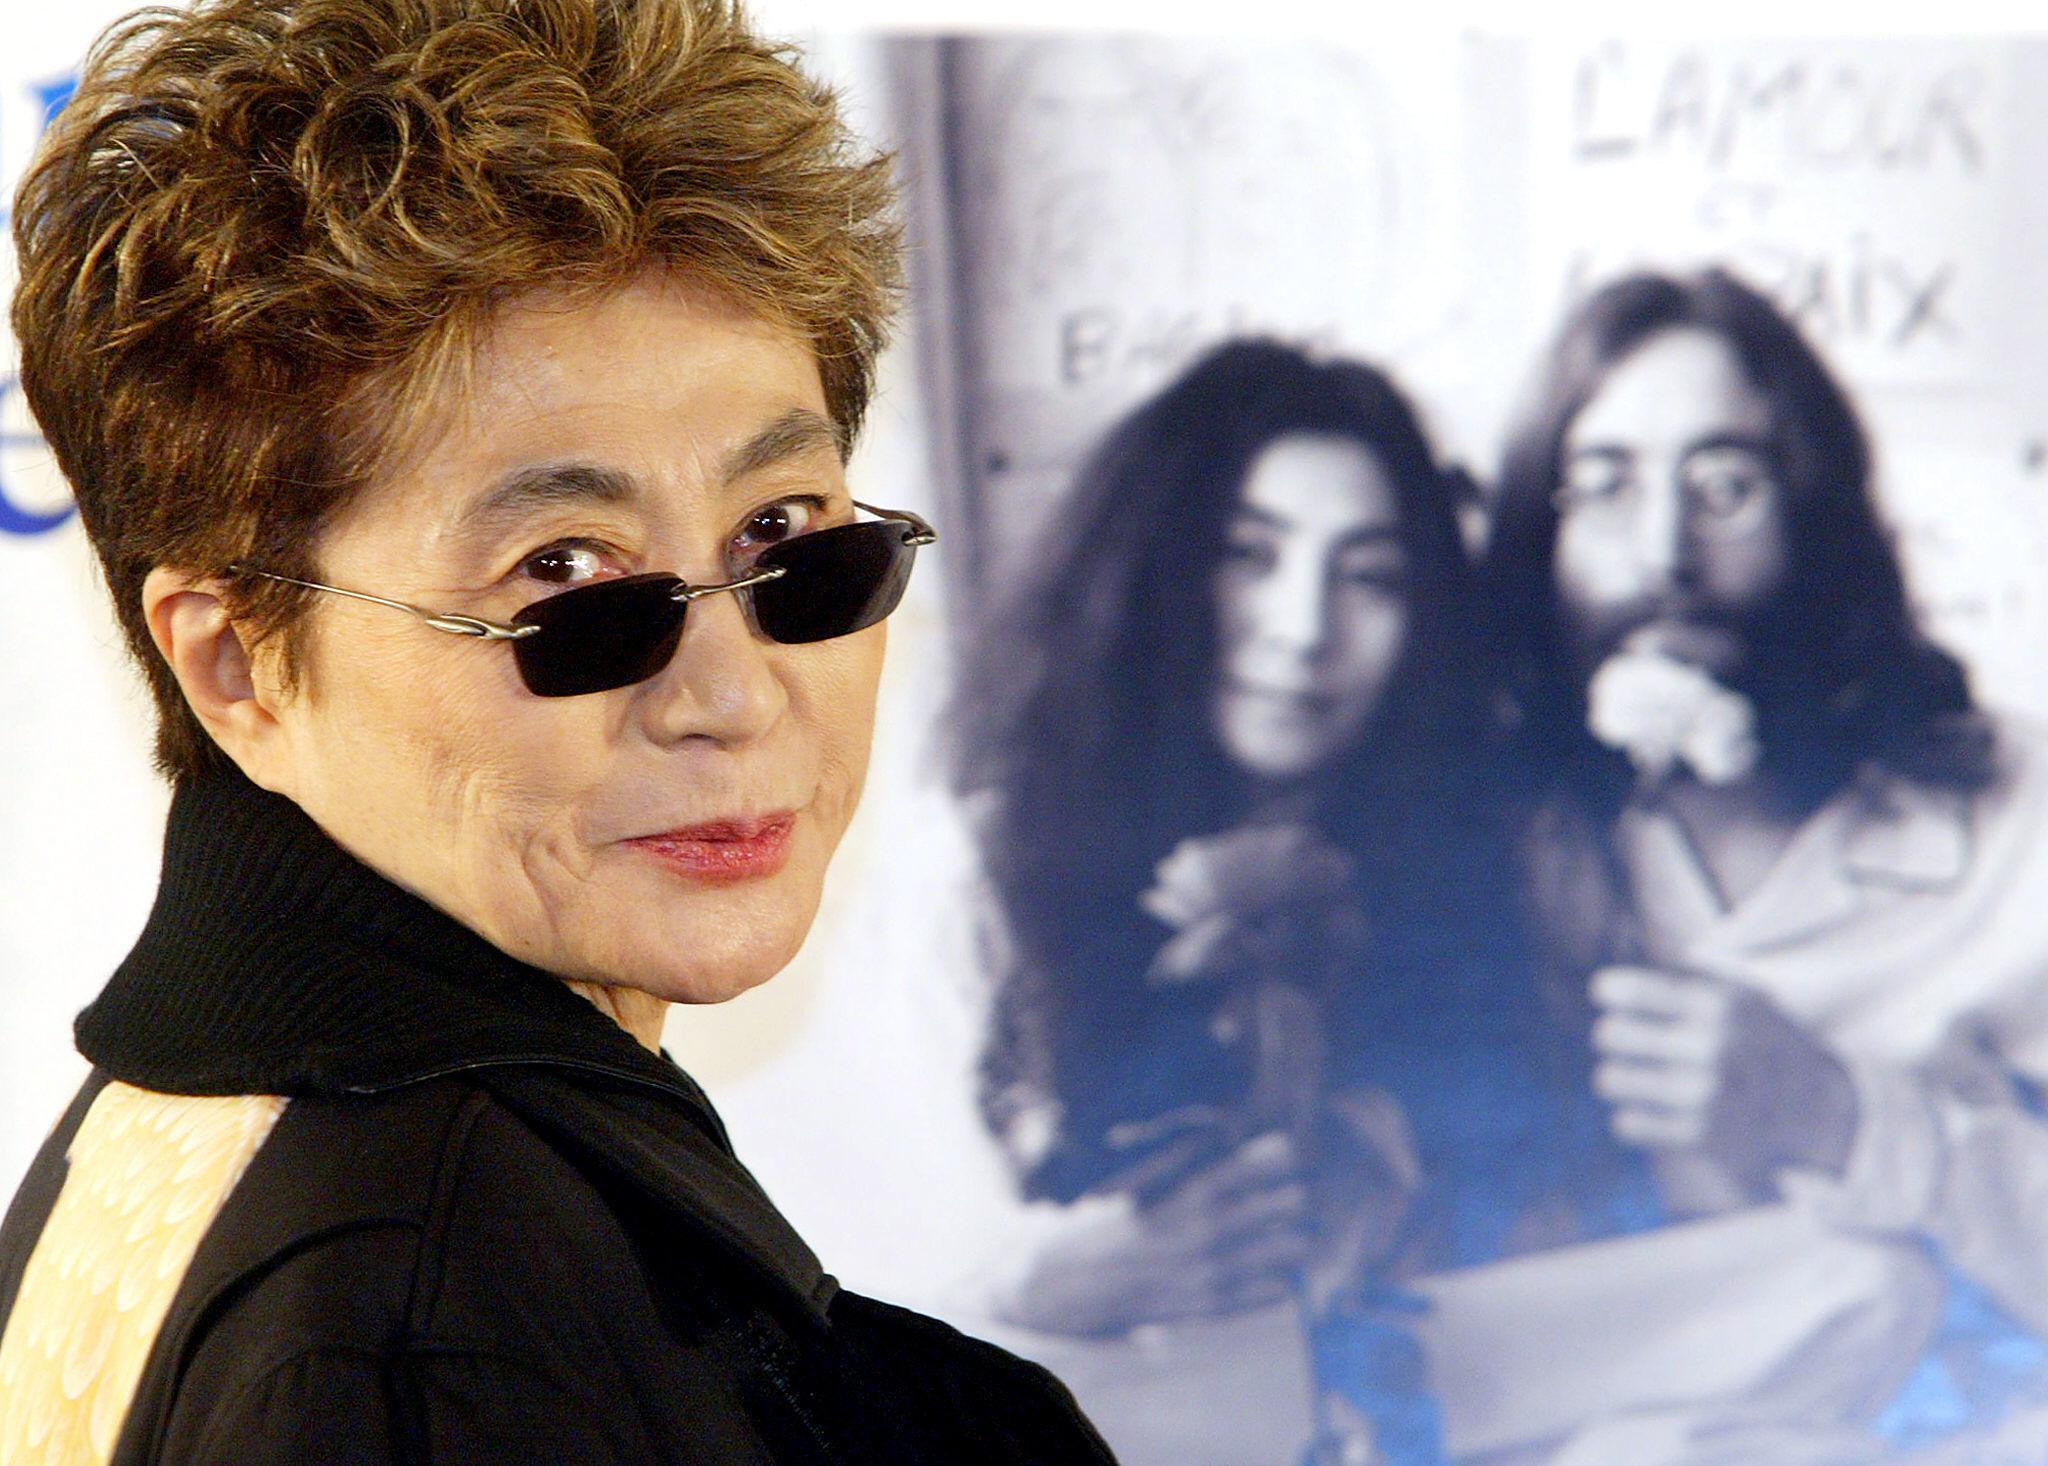 John Lennon Y Yoko Ono: Yoko Ono Set To Receive Credit With John Lennon As